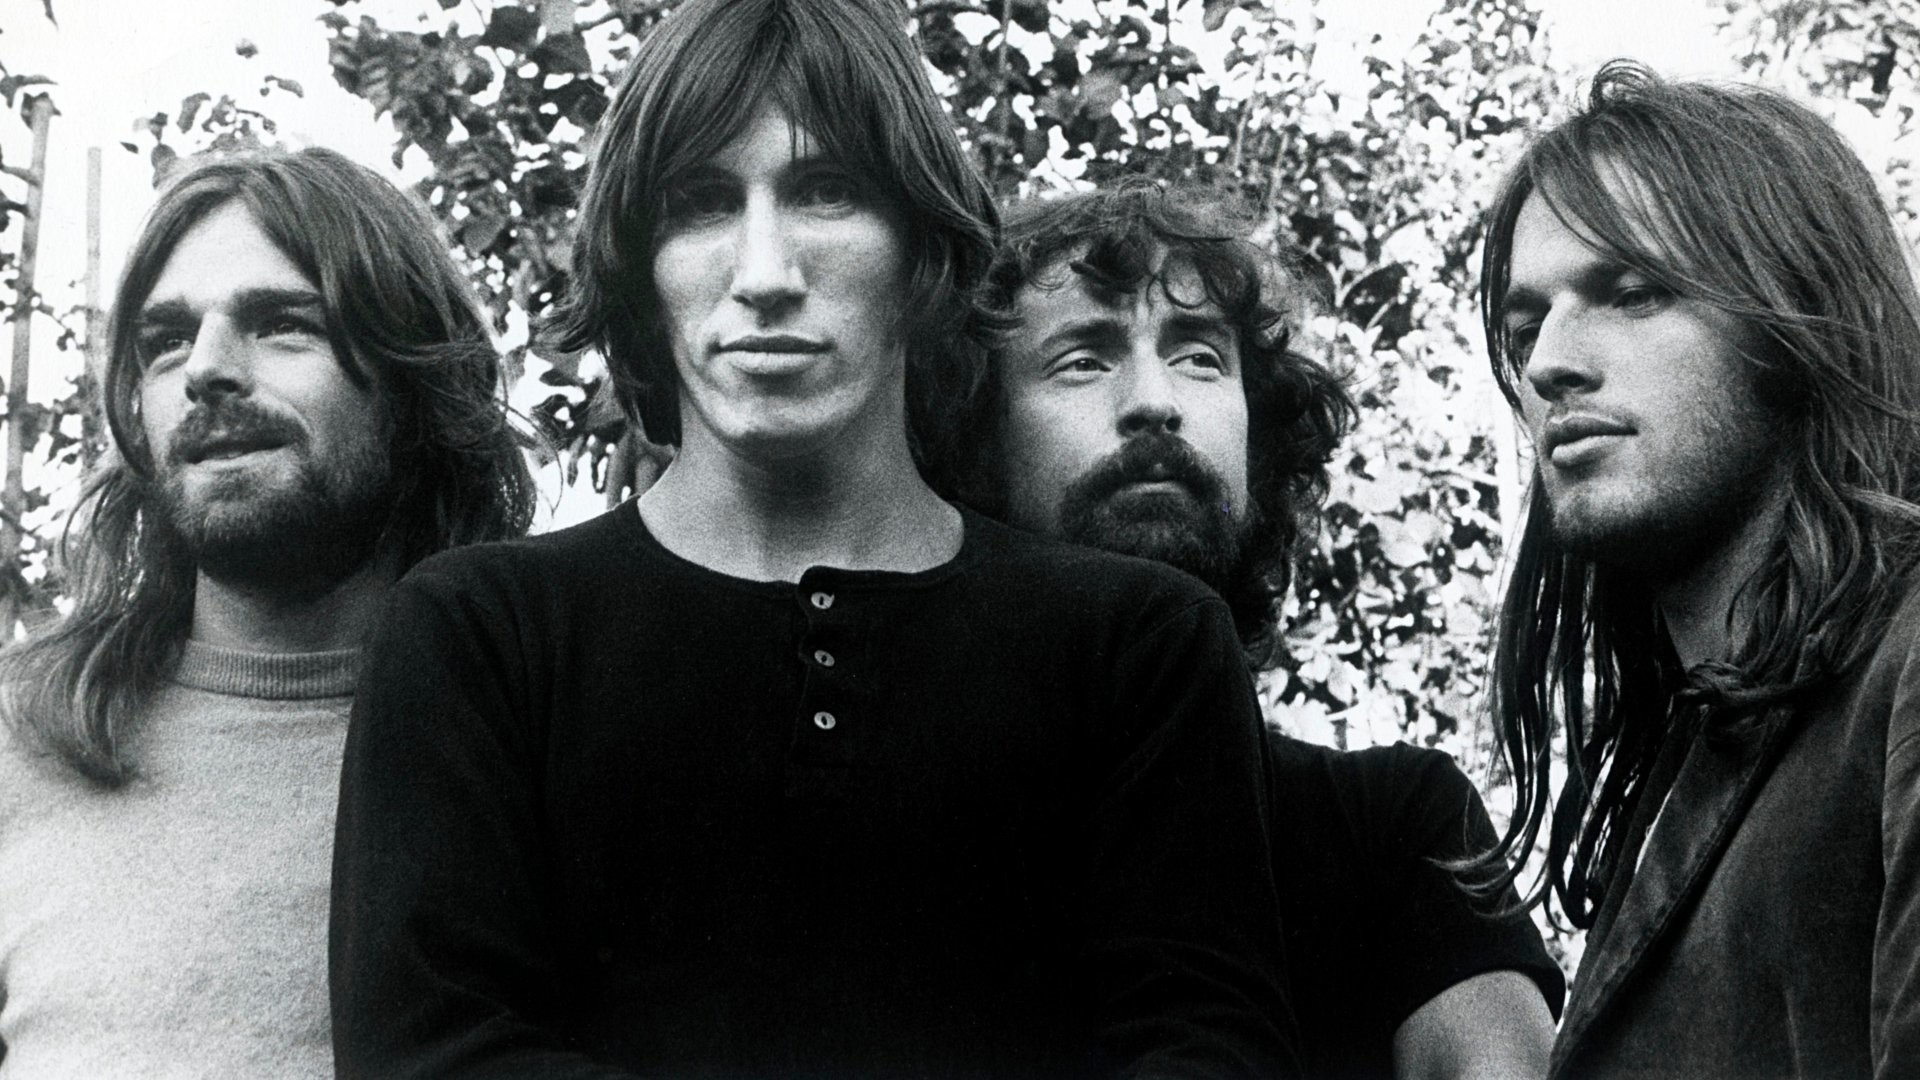 … Pink Floyd Band Members Wallpaper DSOTM Era 1973